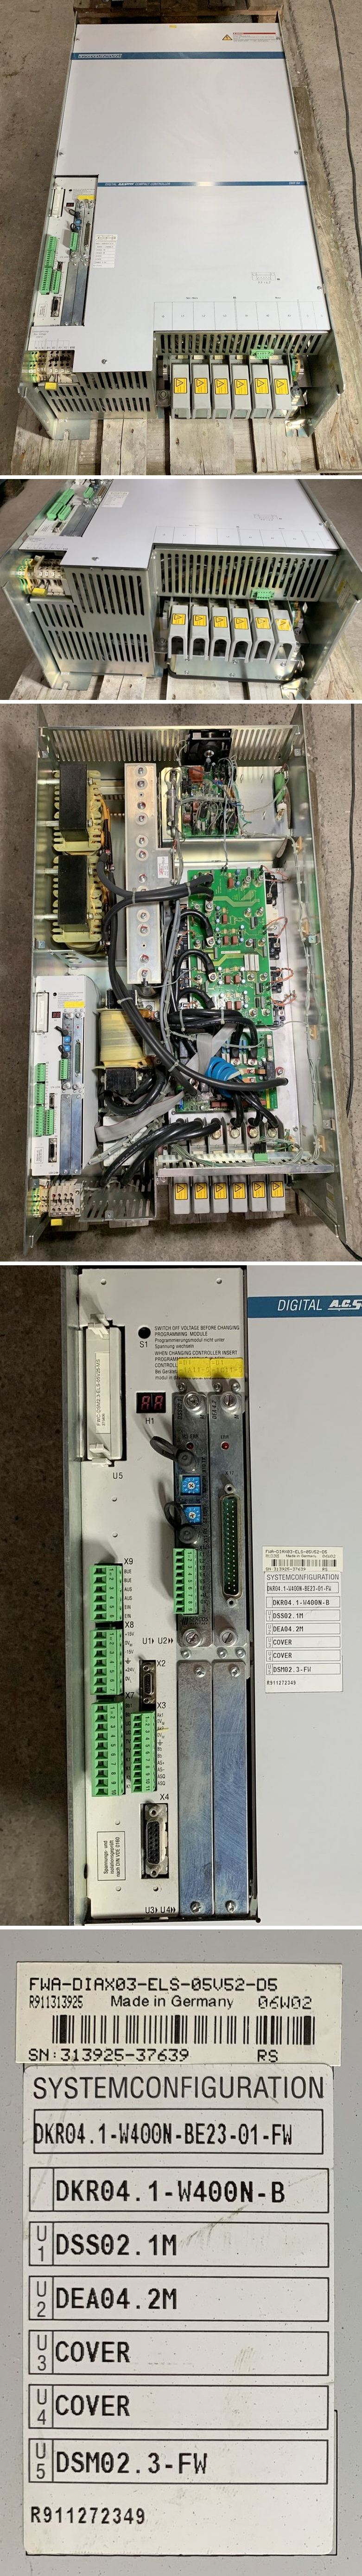 Indramat DKR04.1-W400N-BE23-01-FW